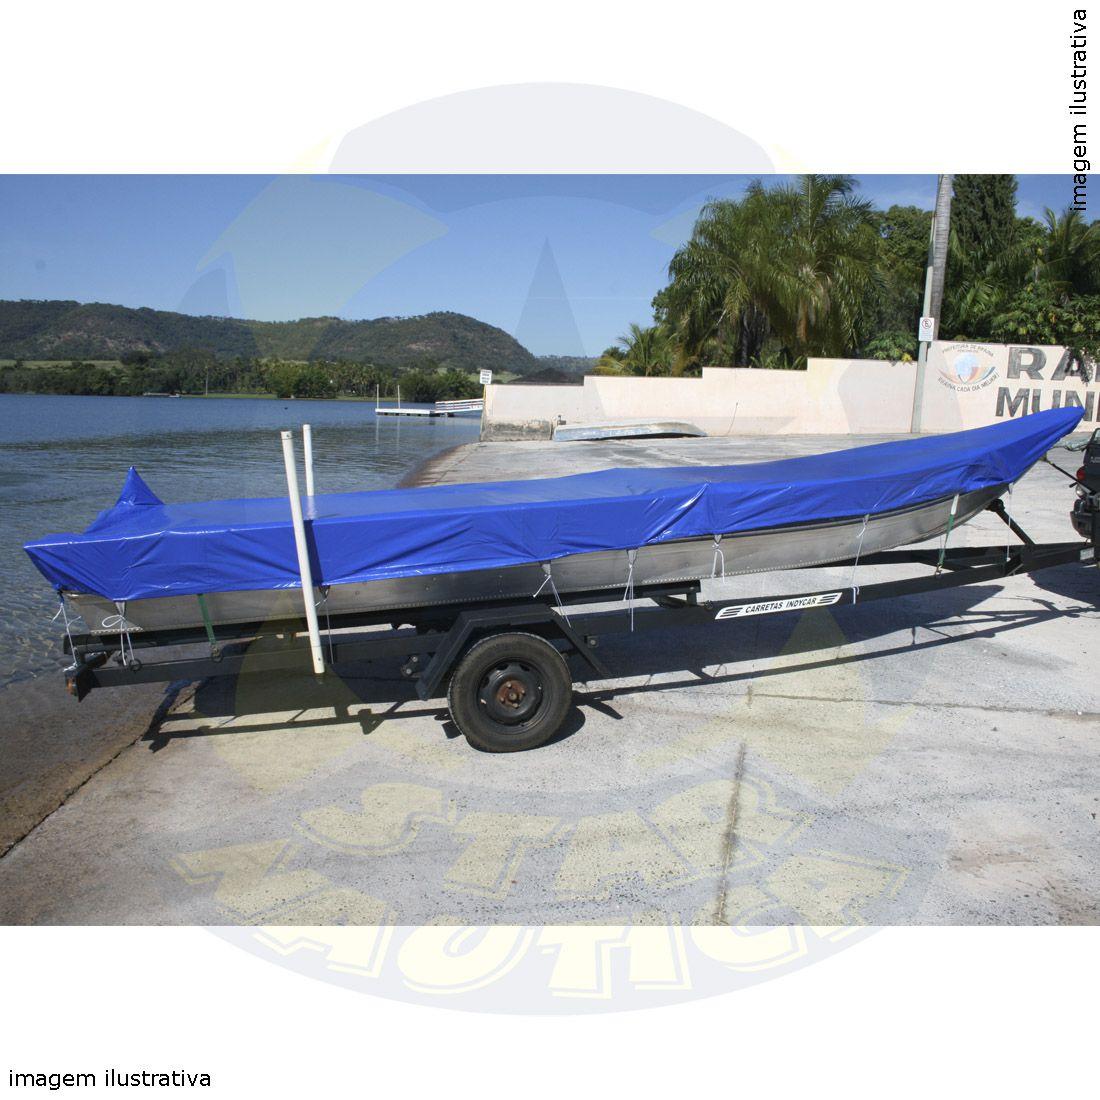 Capa Lona de Cobertura Barco Karib 500 Lona Poliéster